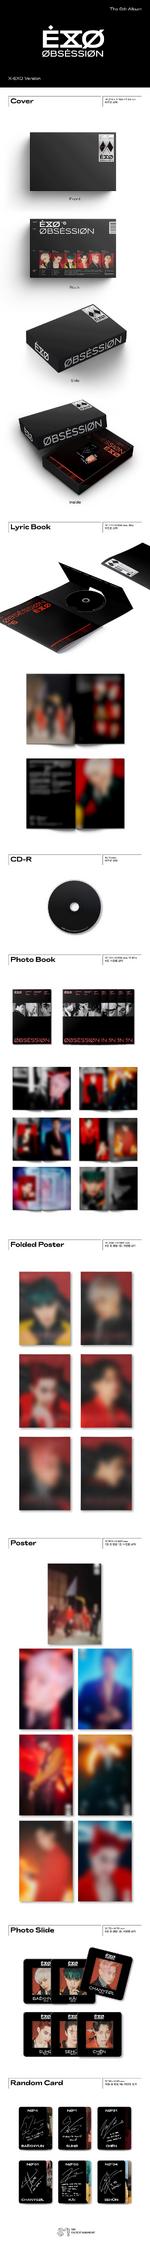 EXO Obsession Album Details X-EXO Ver.